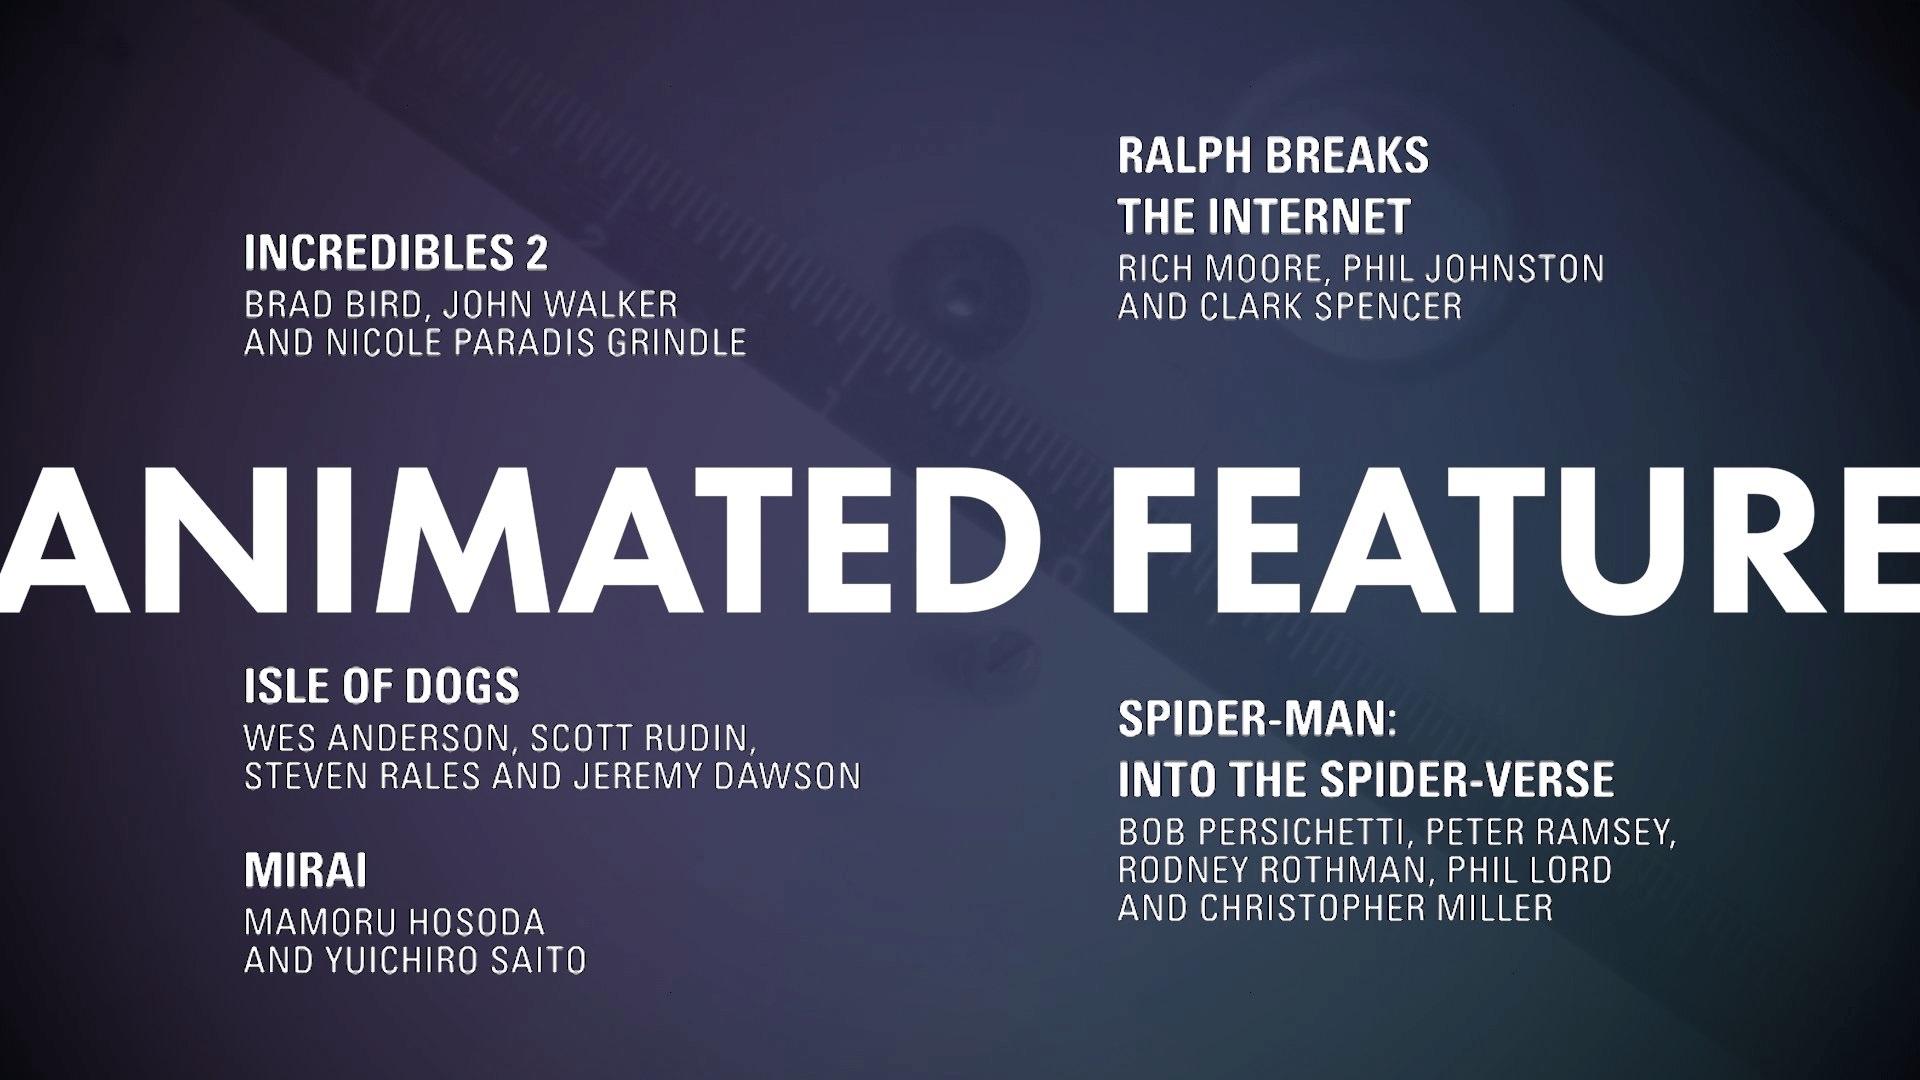 Oscars 2019 nominations list